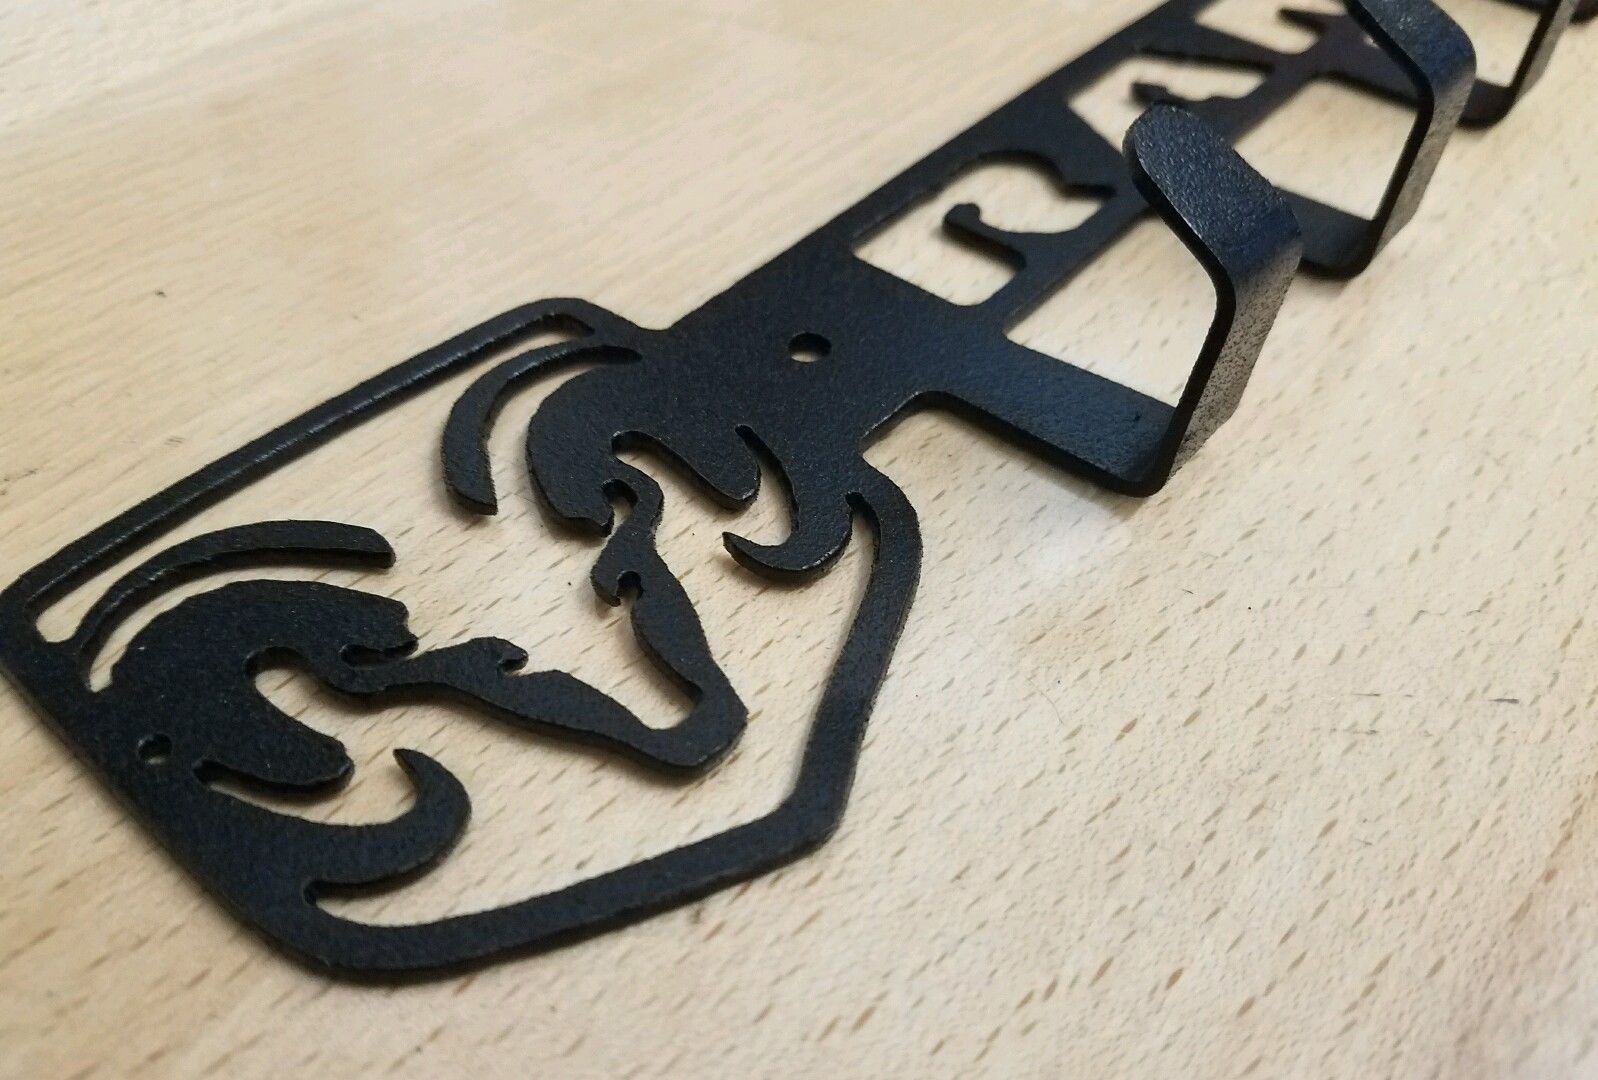 Dodge Ram Key Chain Fob Holder Metal Art Plasma Cut Gift